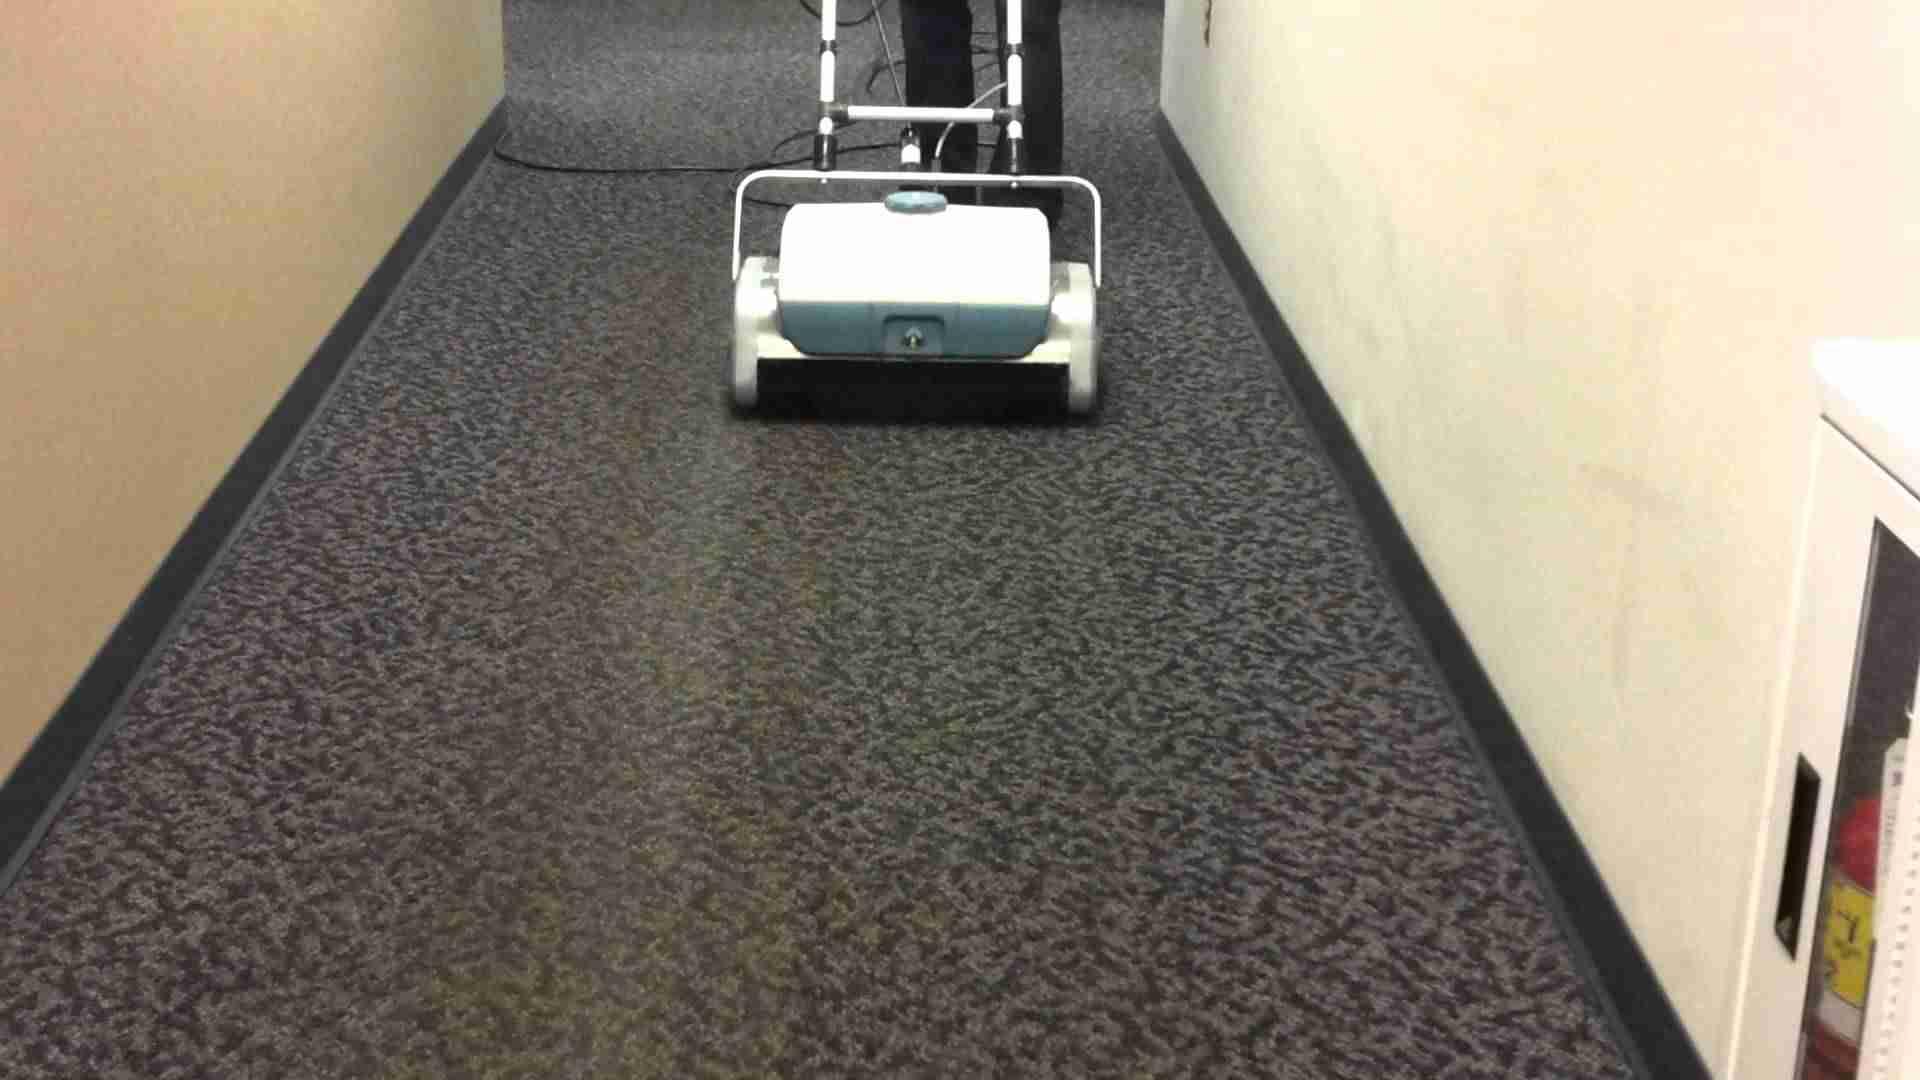 Carpet cleaning service stockton ca